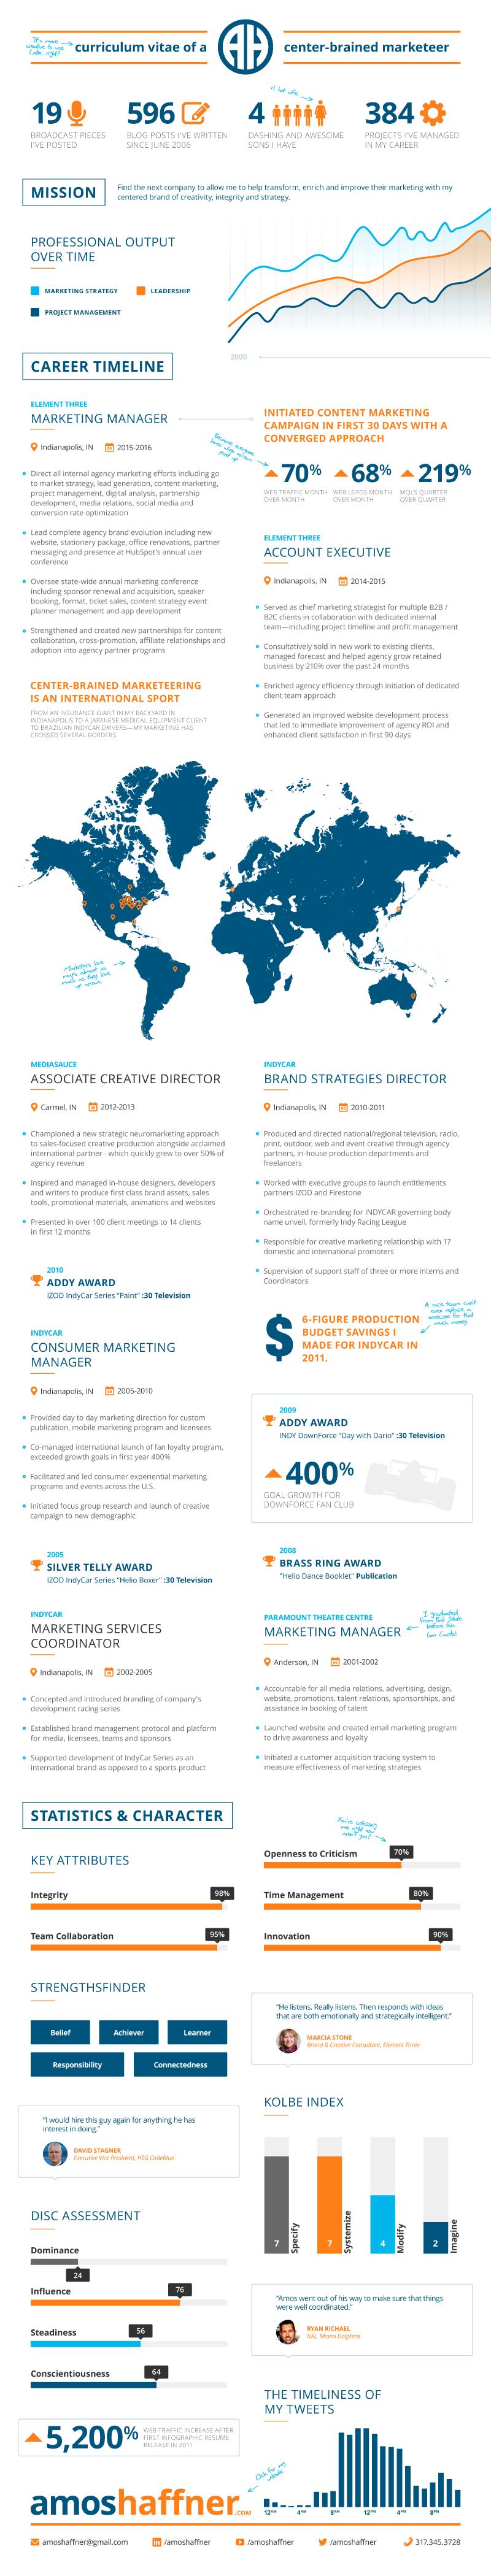 amos_haffner_infographic_resume_20161